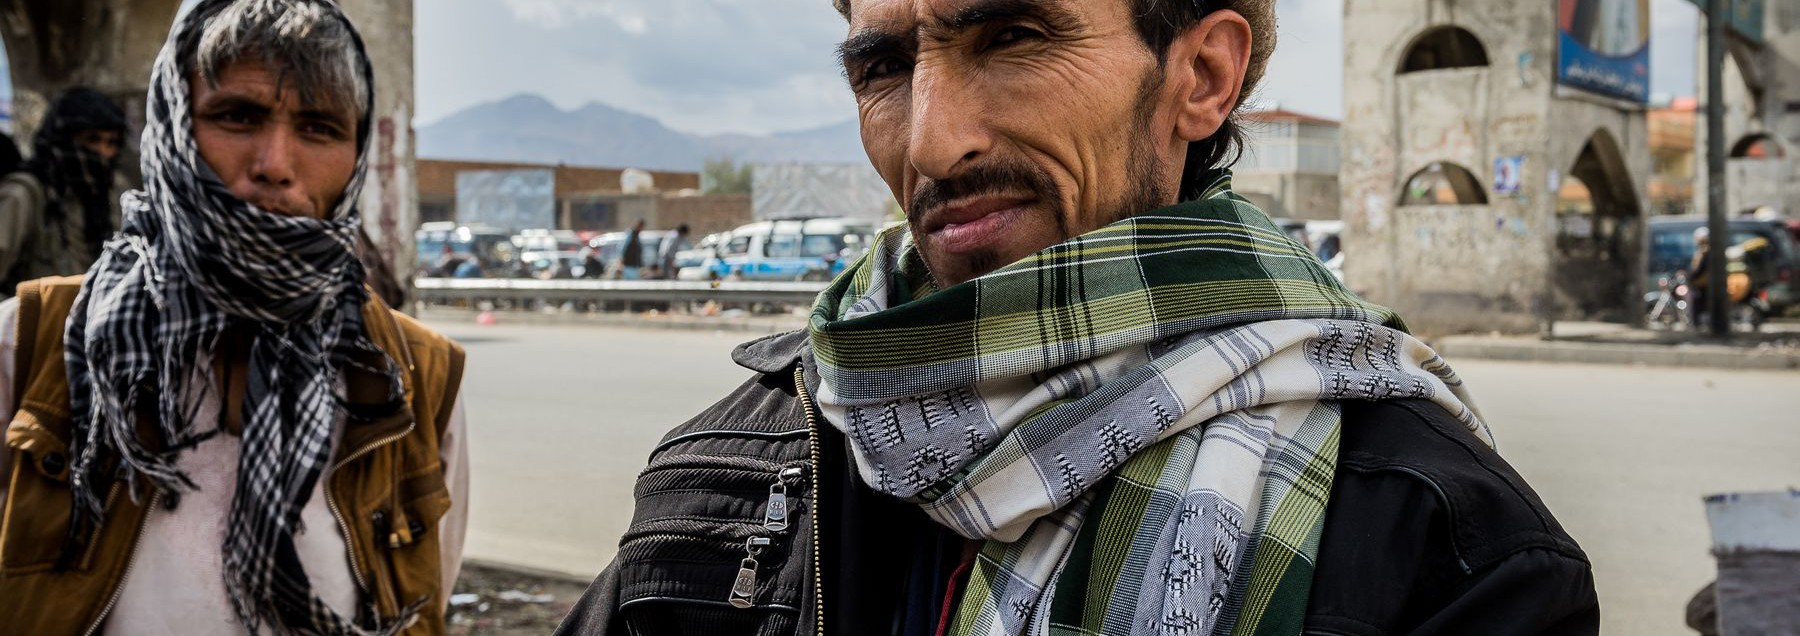 Il sangue degli afgani è gratis